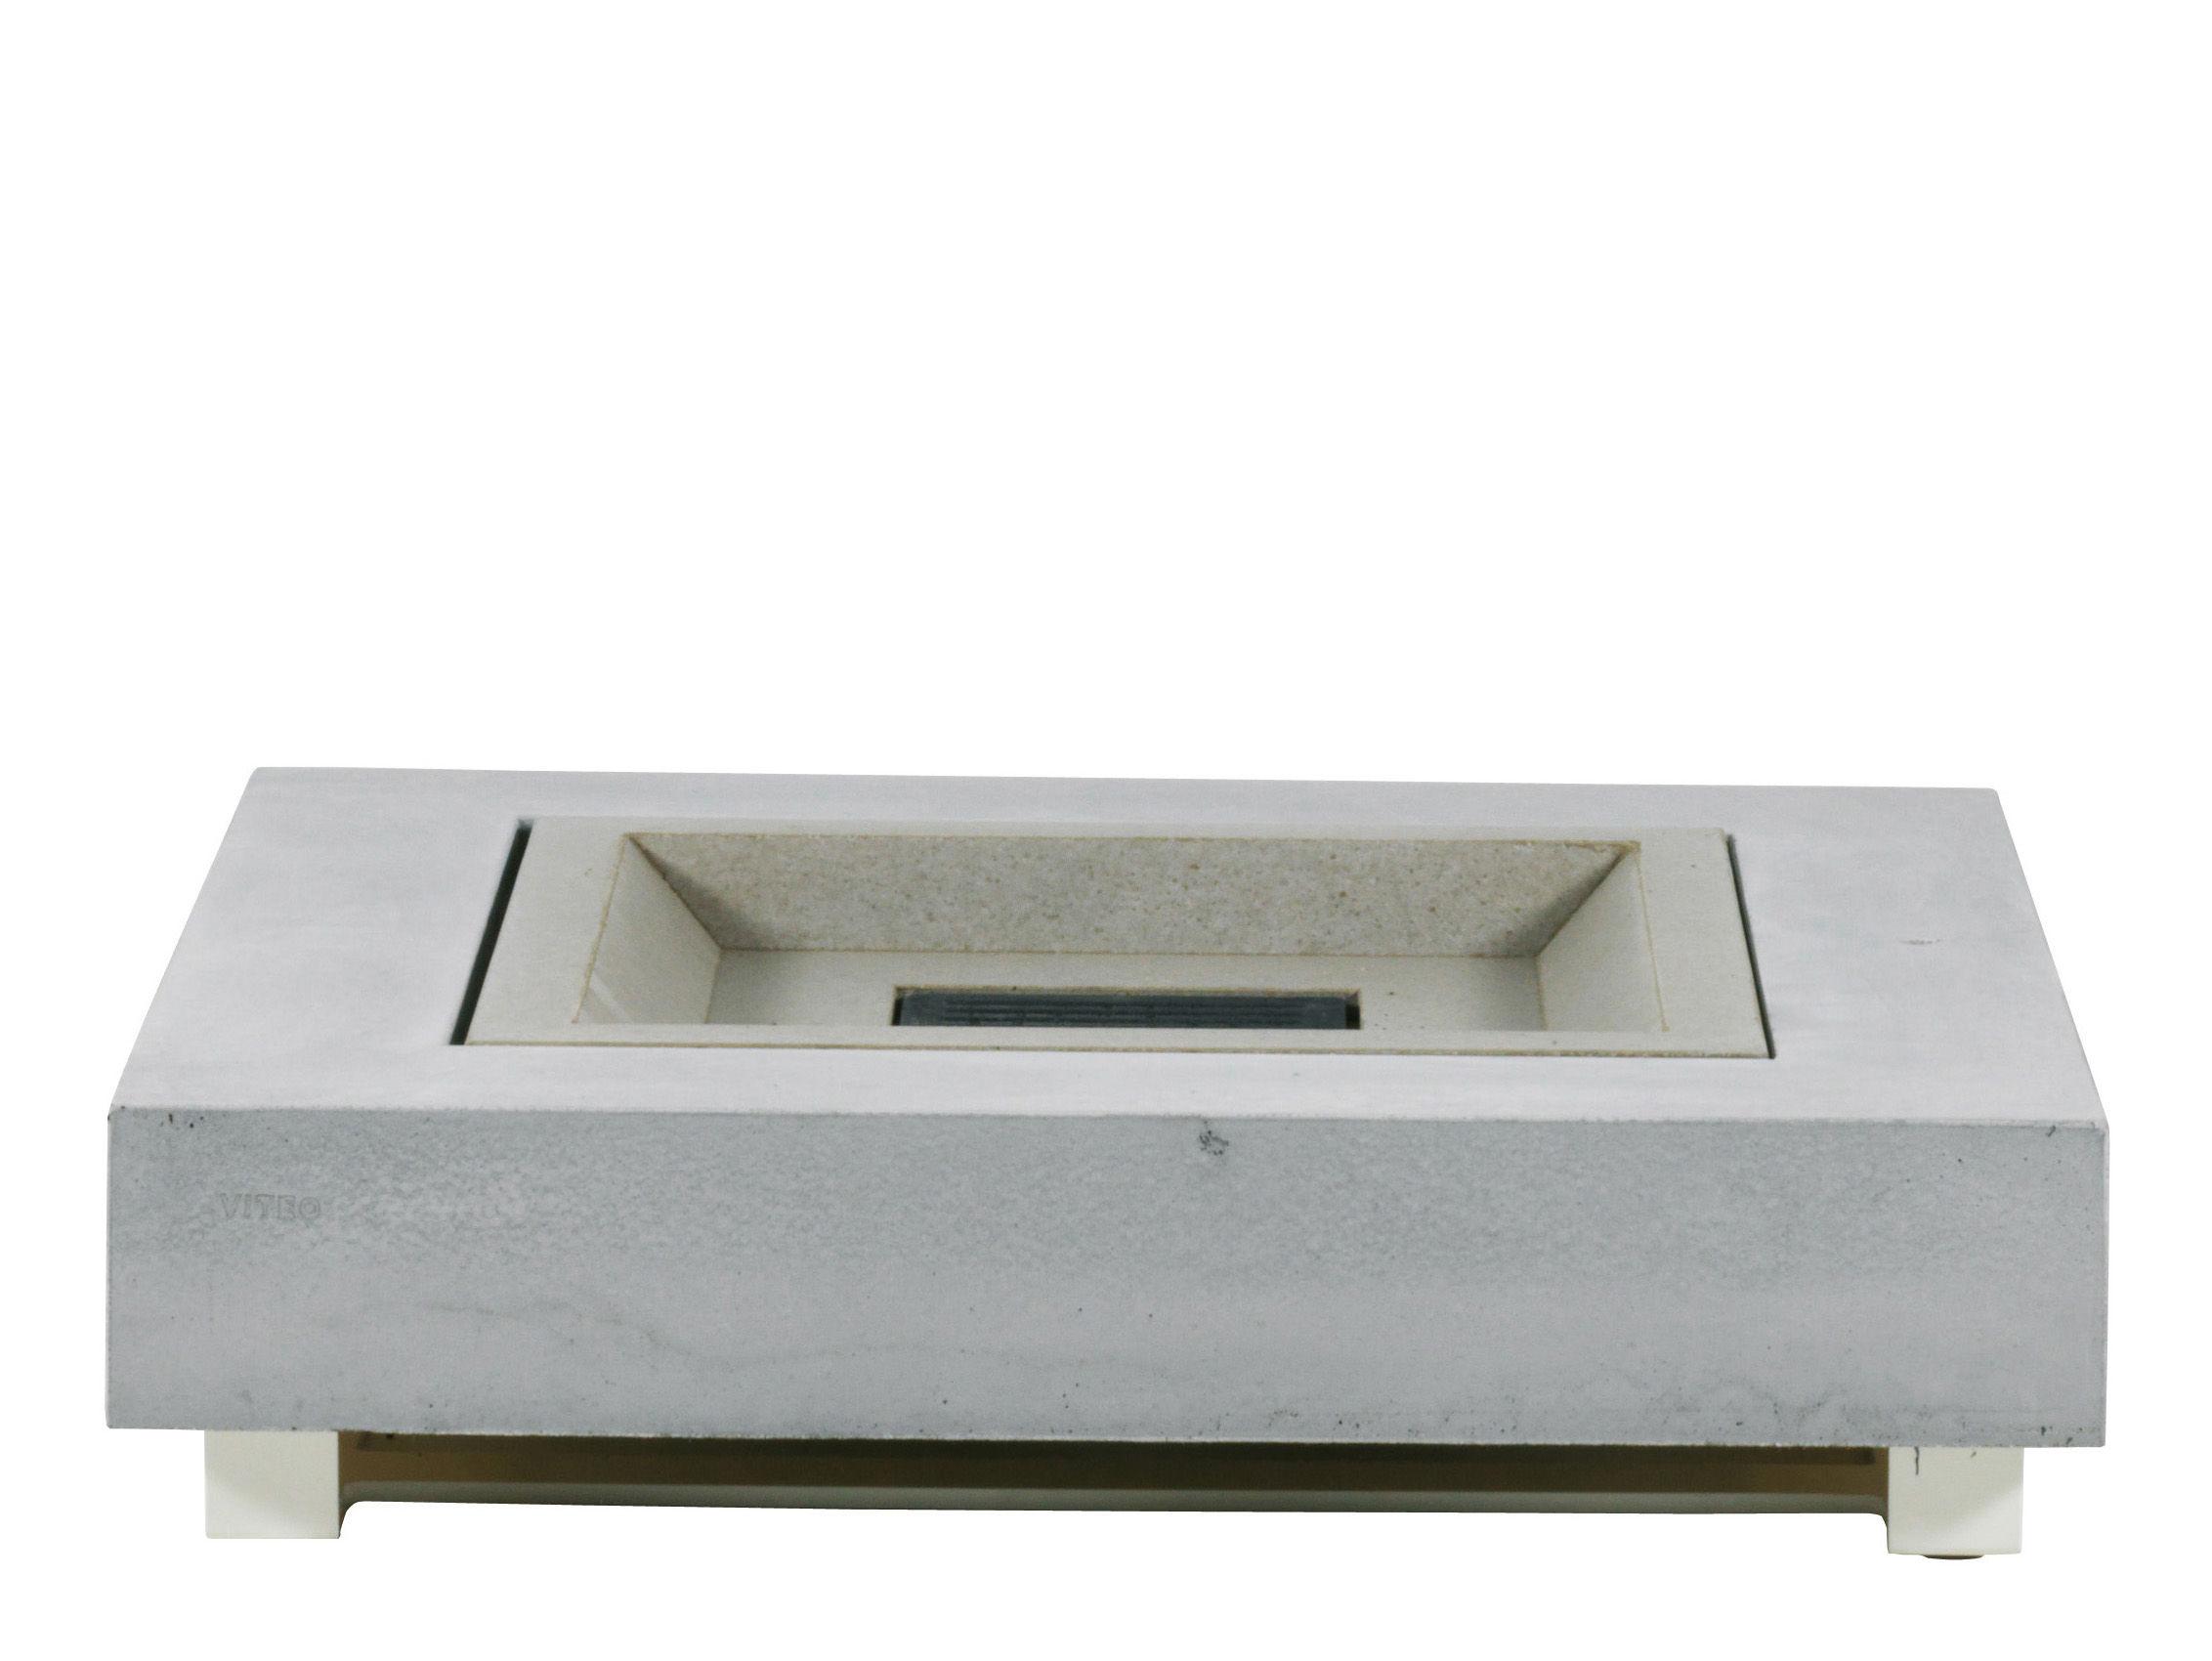 table basse pure brasero b ton 90 x 90 cm table basse brasero b ton viteo. Black Bedroom Furniture Sets. Home Design Ideas